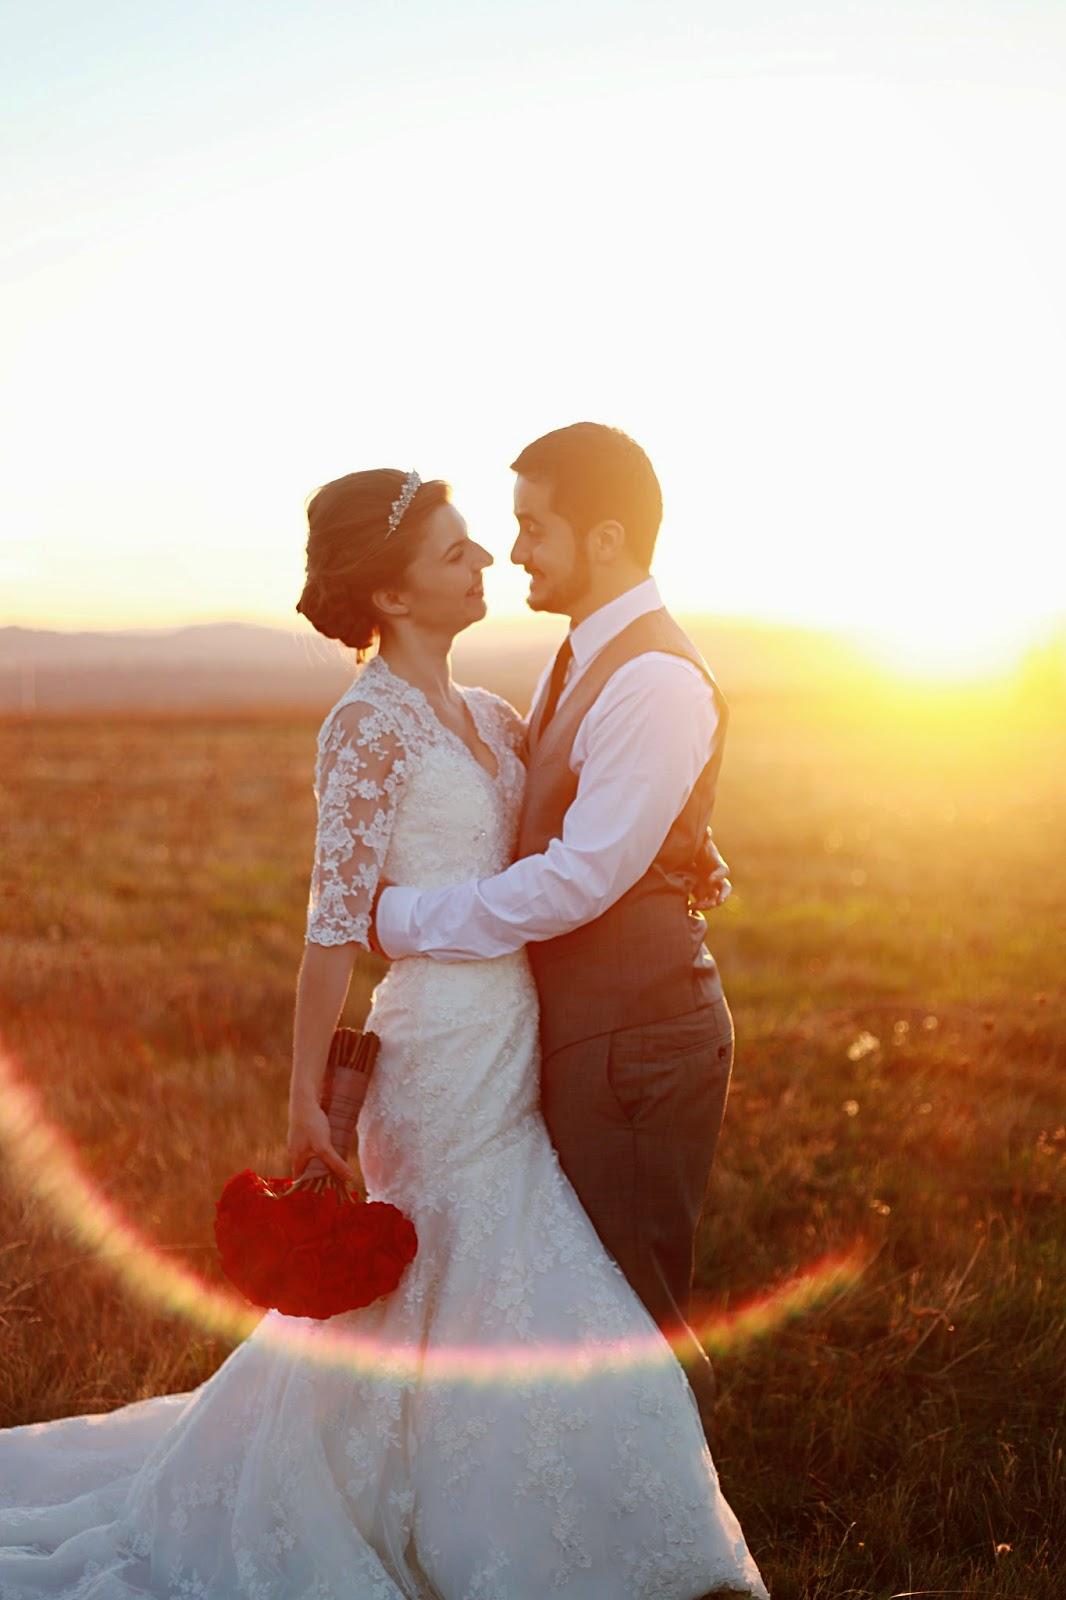 spotted stills photography, wedding, portland wedding, portland wedding photographer, oregon wedding photohgrapher, bride, groom, sunset, love, wedding, jenn pacurar